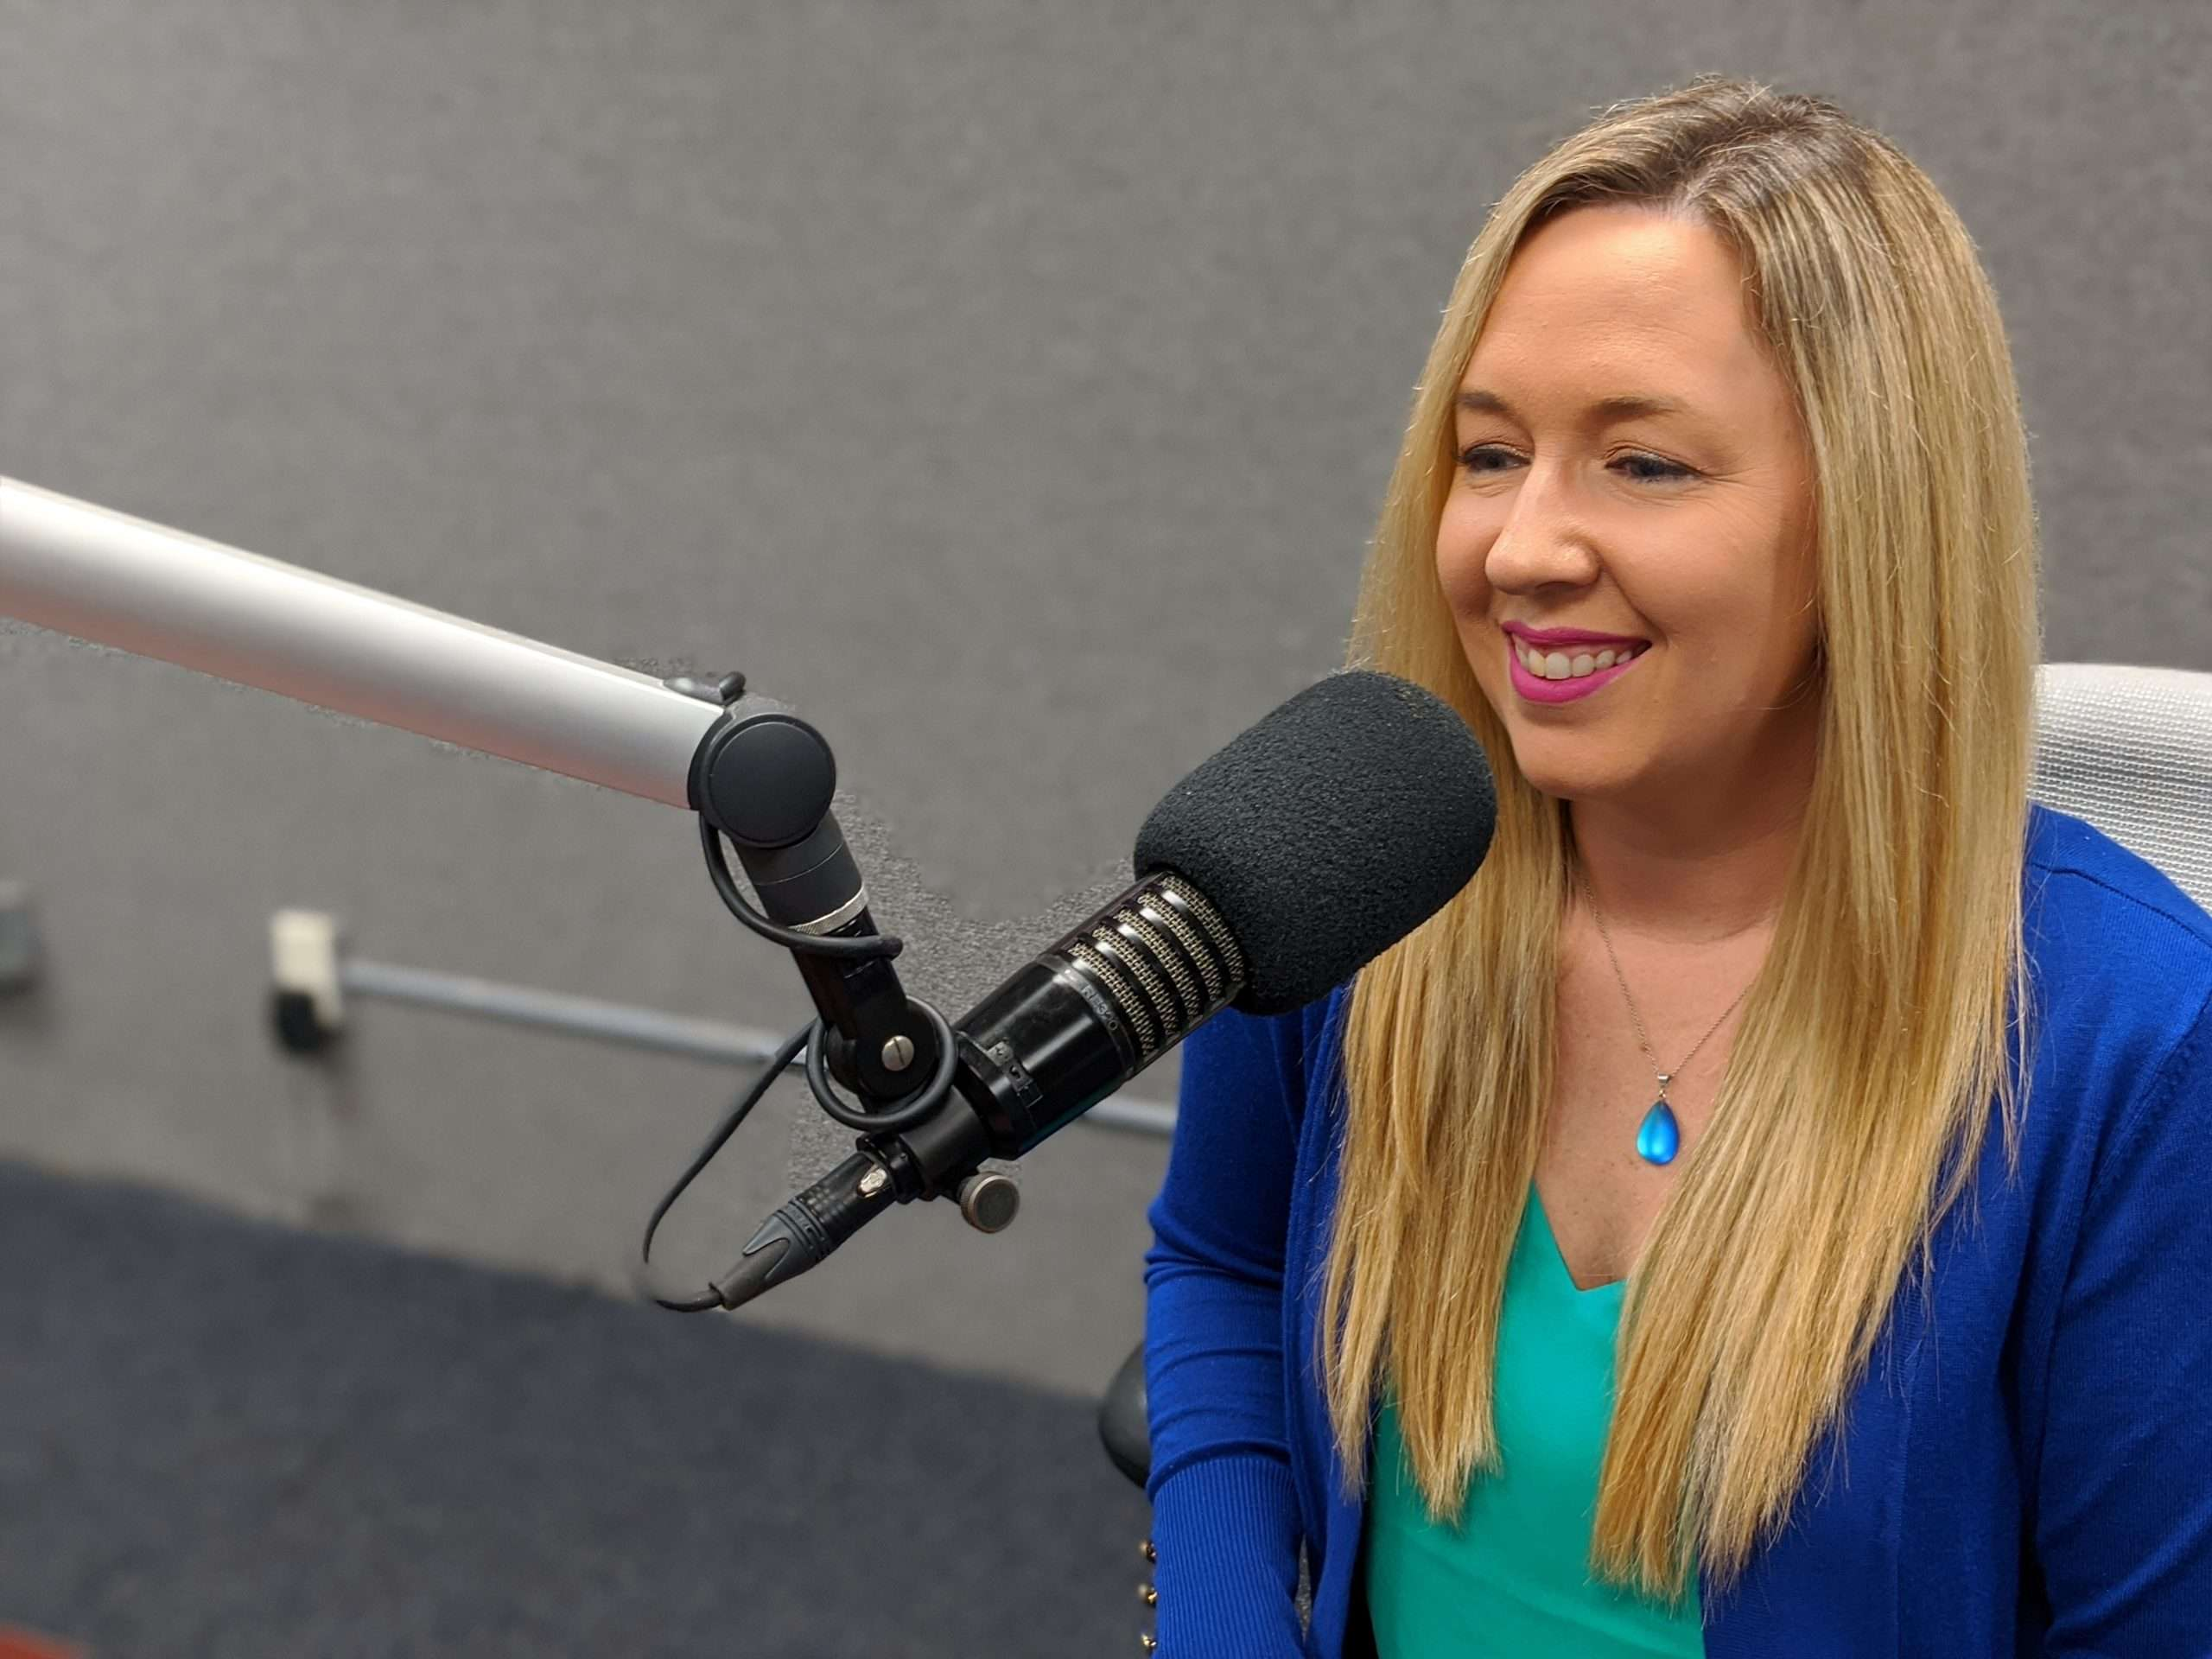 Kristi Dosh podcasting